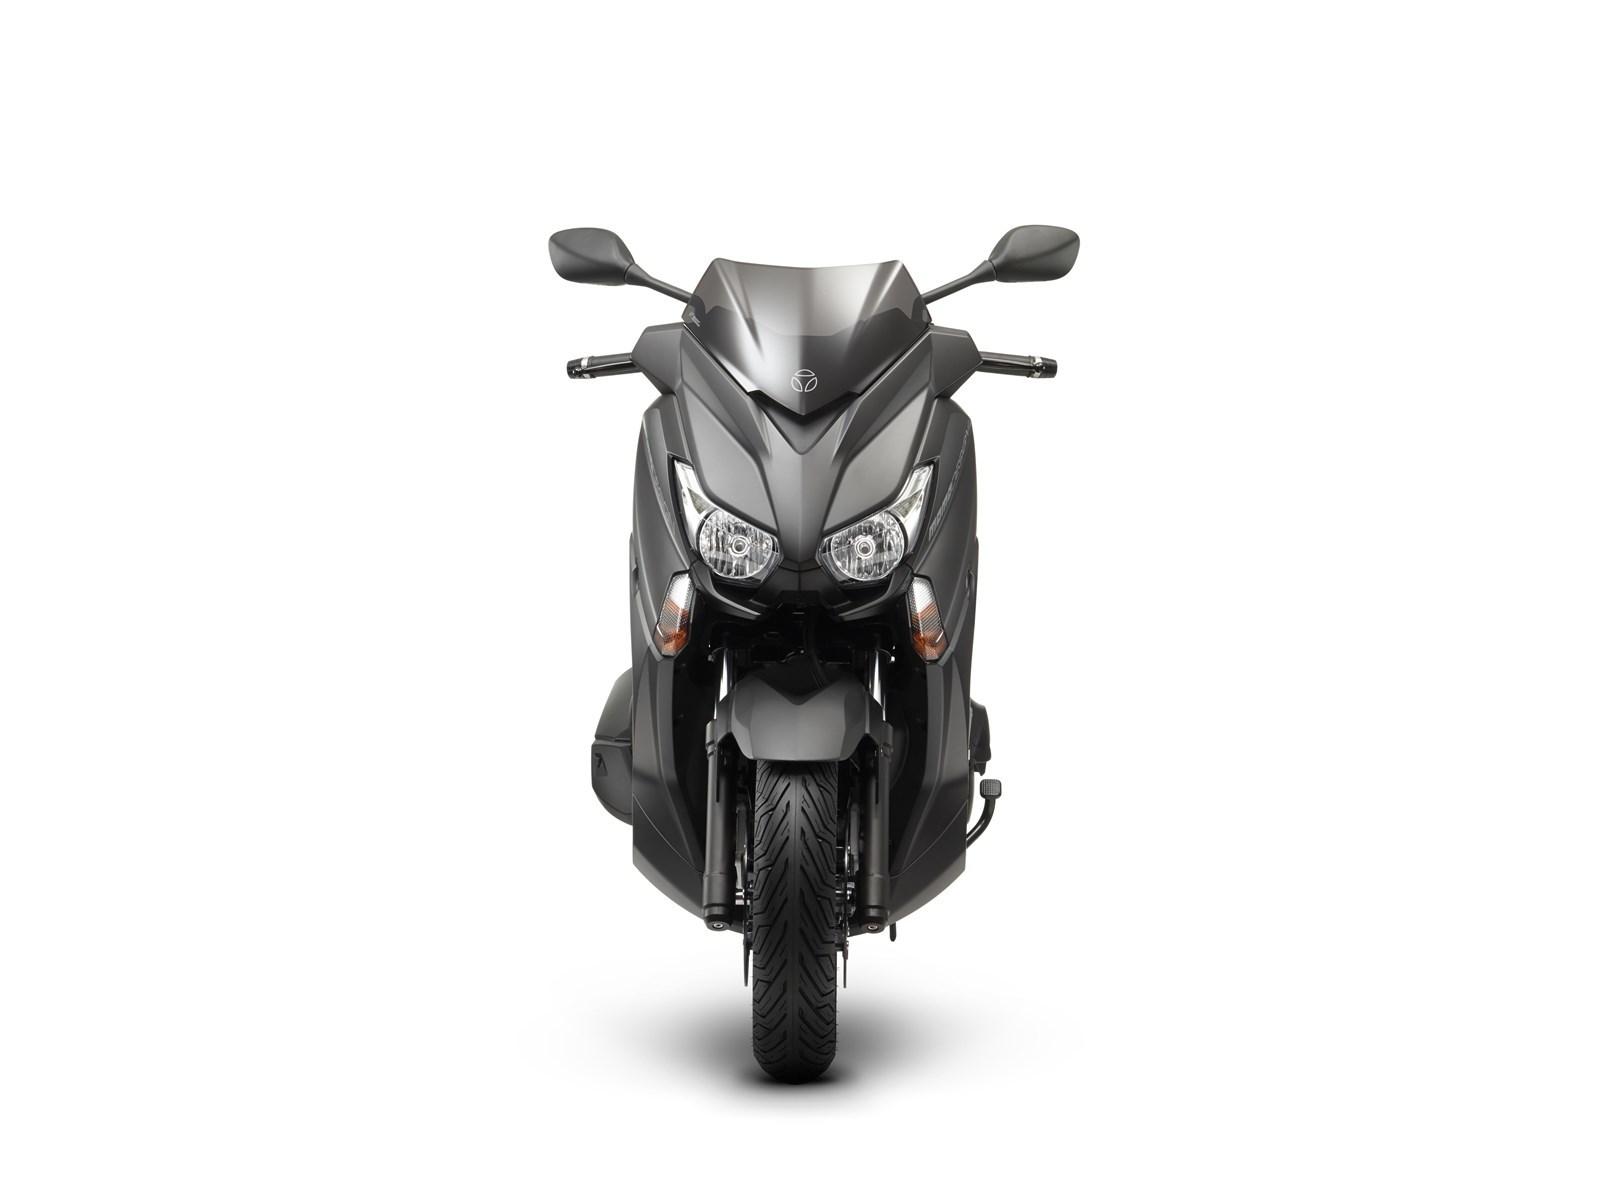 Foto de Yamaha X-MAX 400 MOMODESIGN, estudio y detalles (6/33)